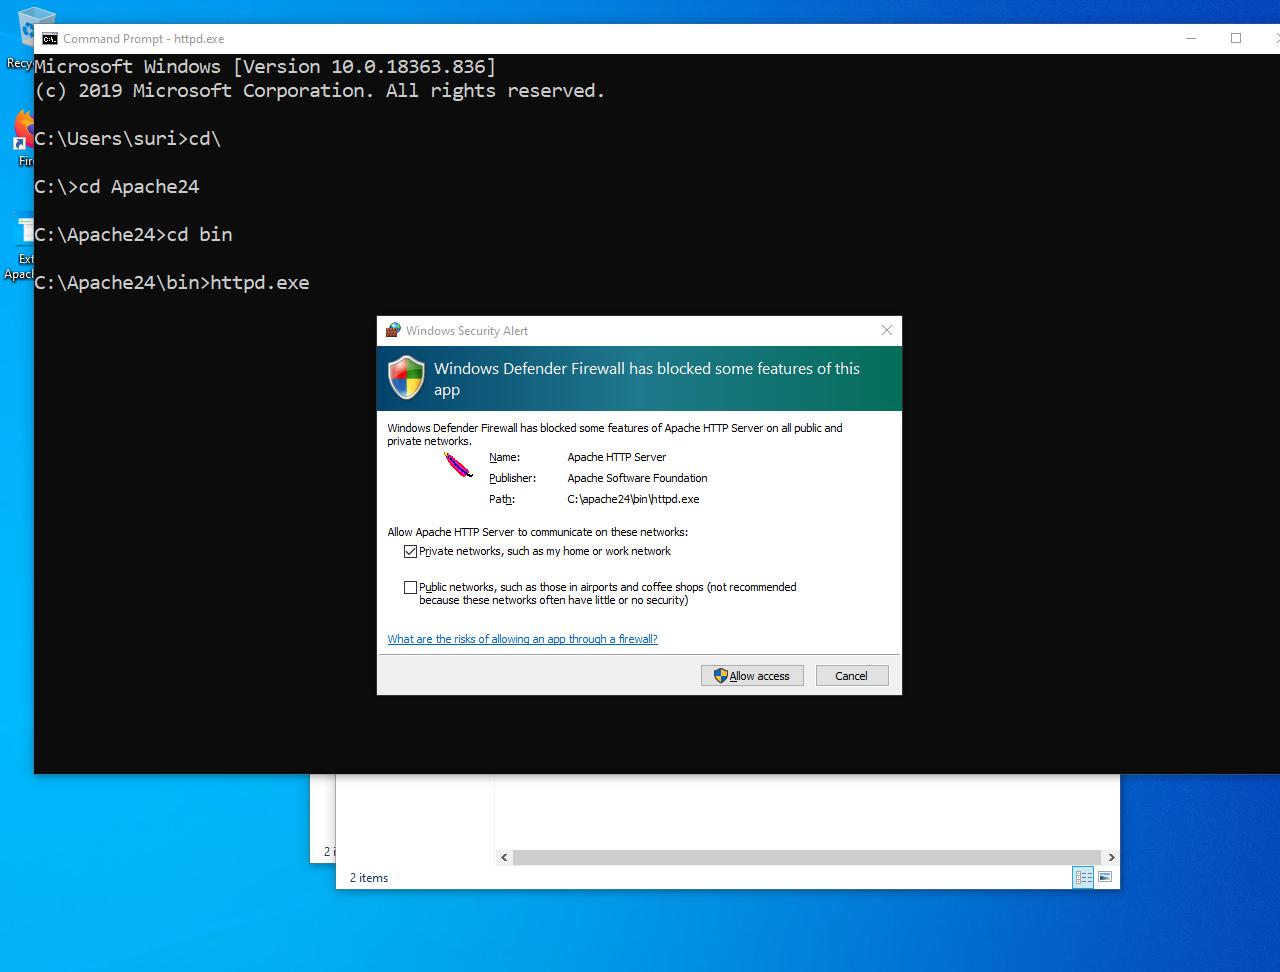 Windows Defender Firewall Apache